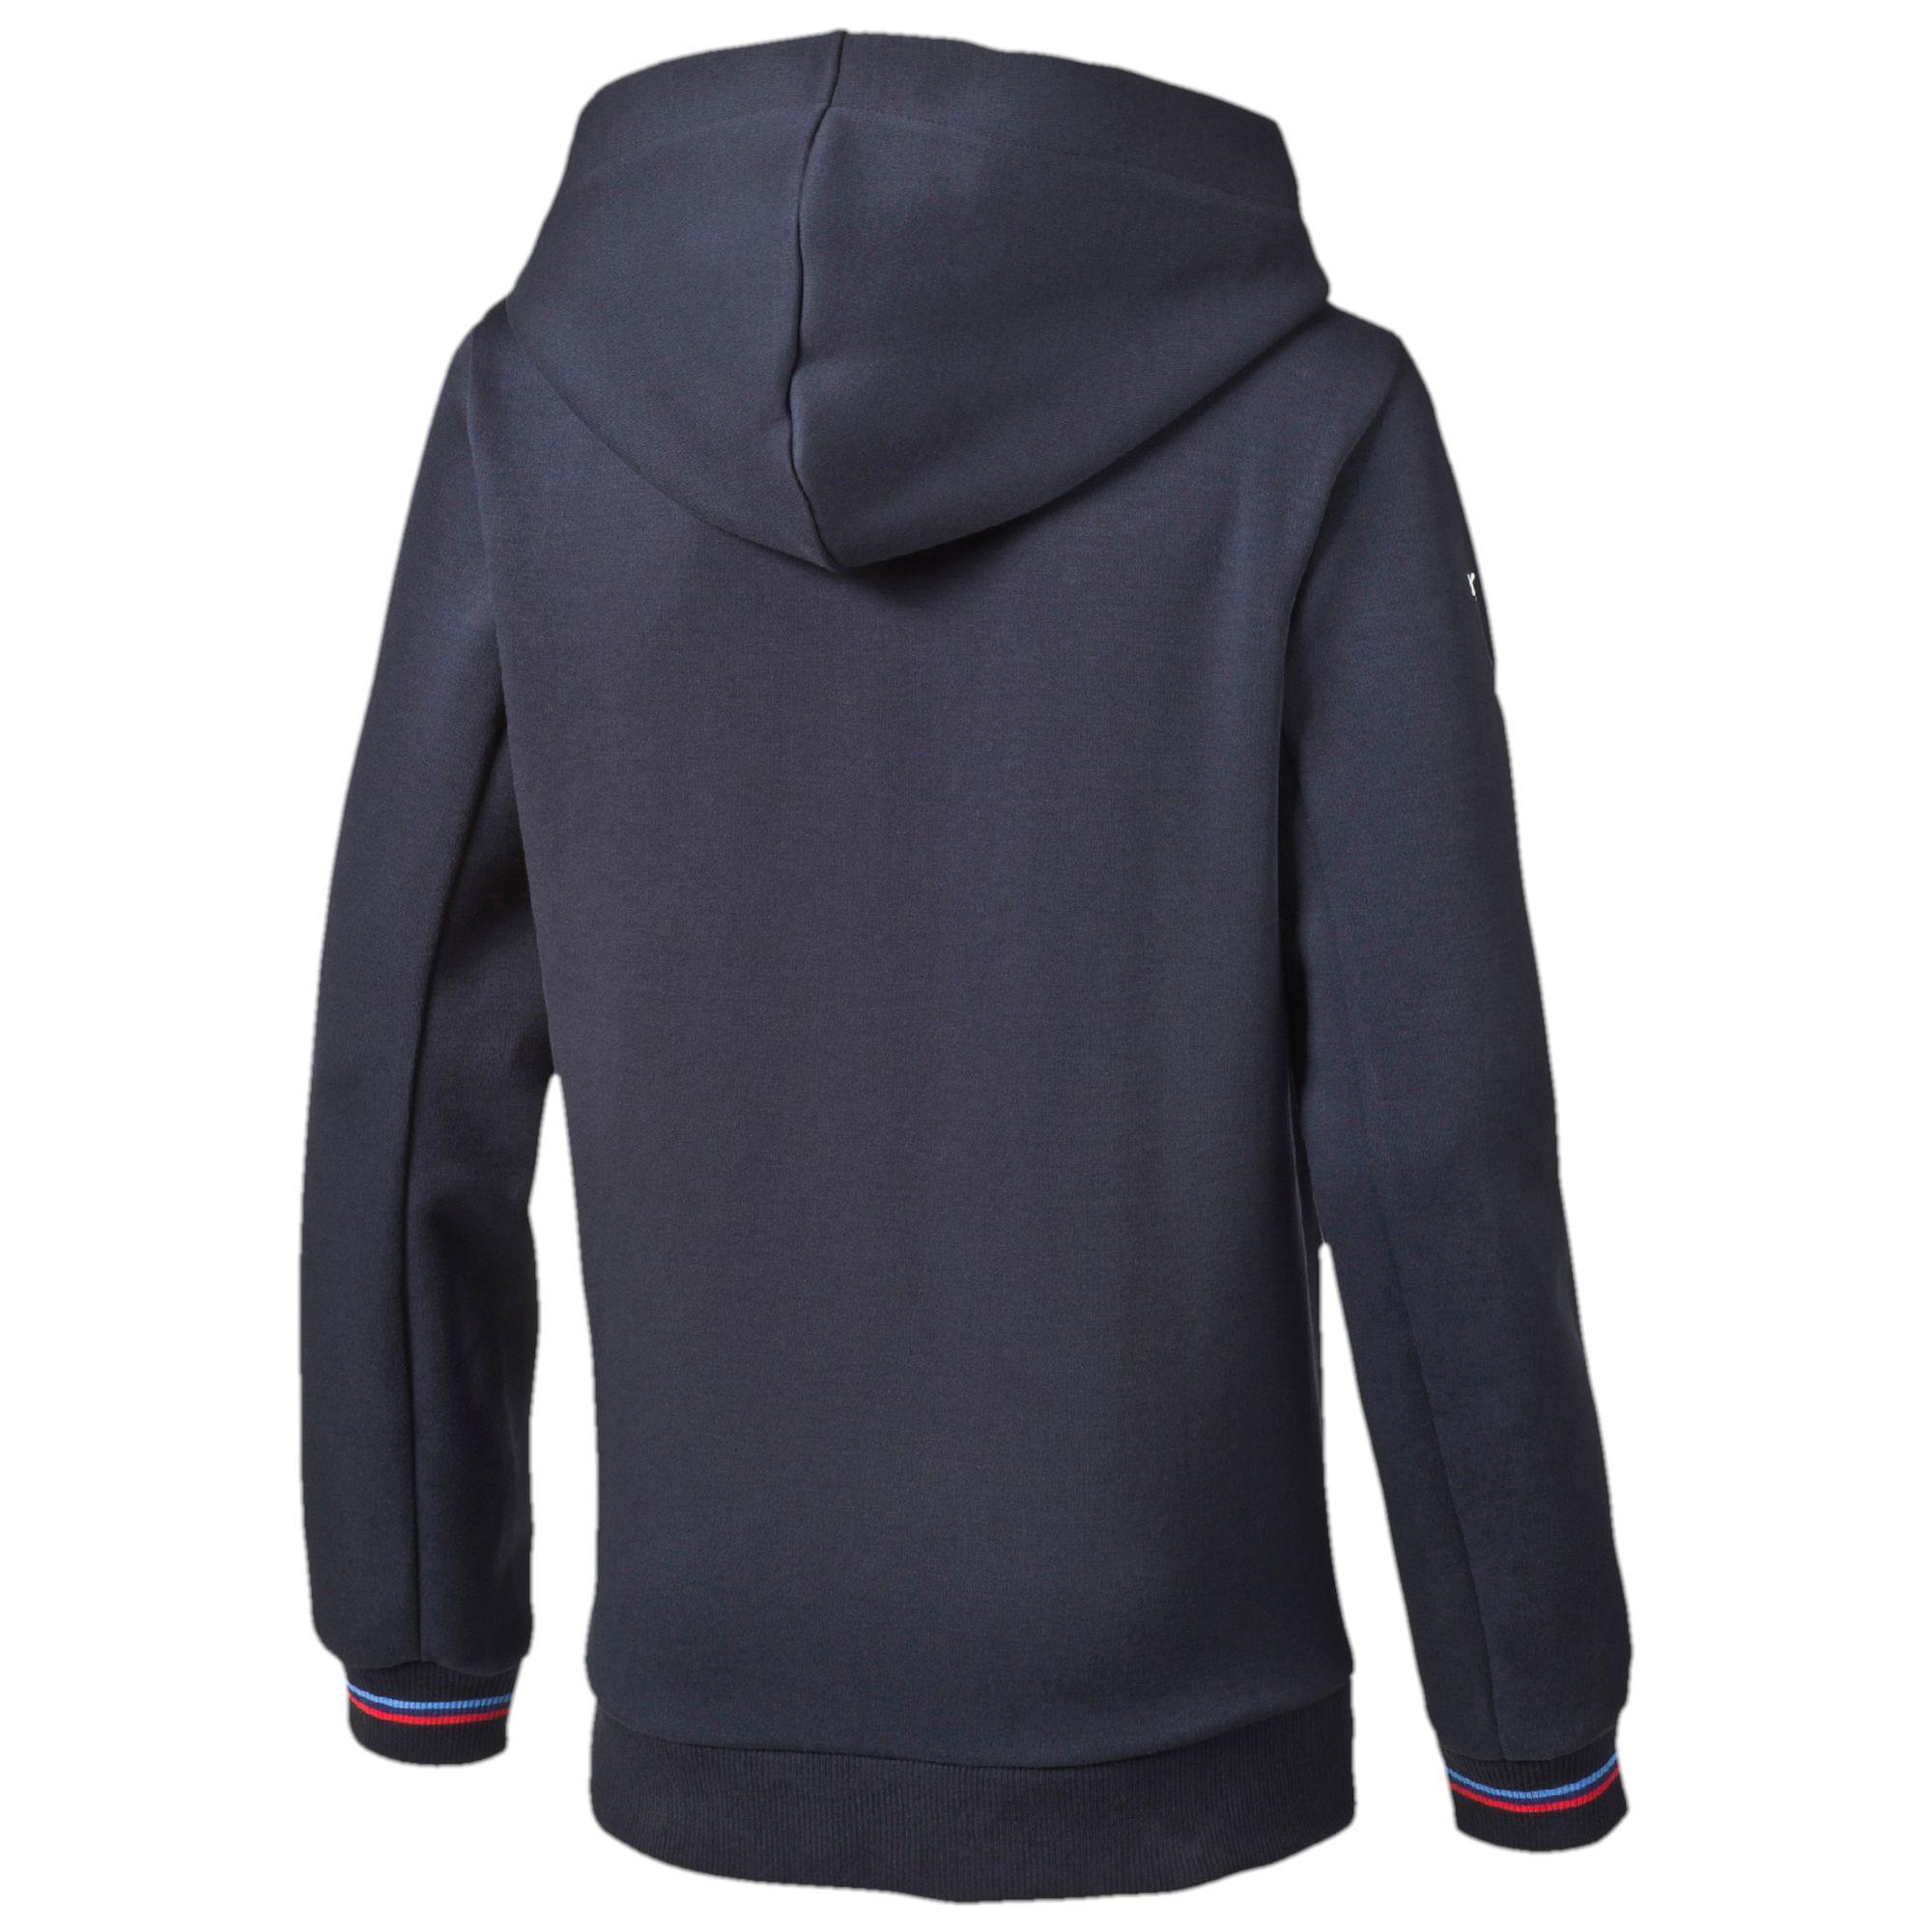 team shirt clothing p iris methyl blue black tshirt afc top sale puma bmw lrg training men t cheap motorsport